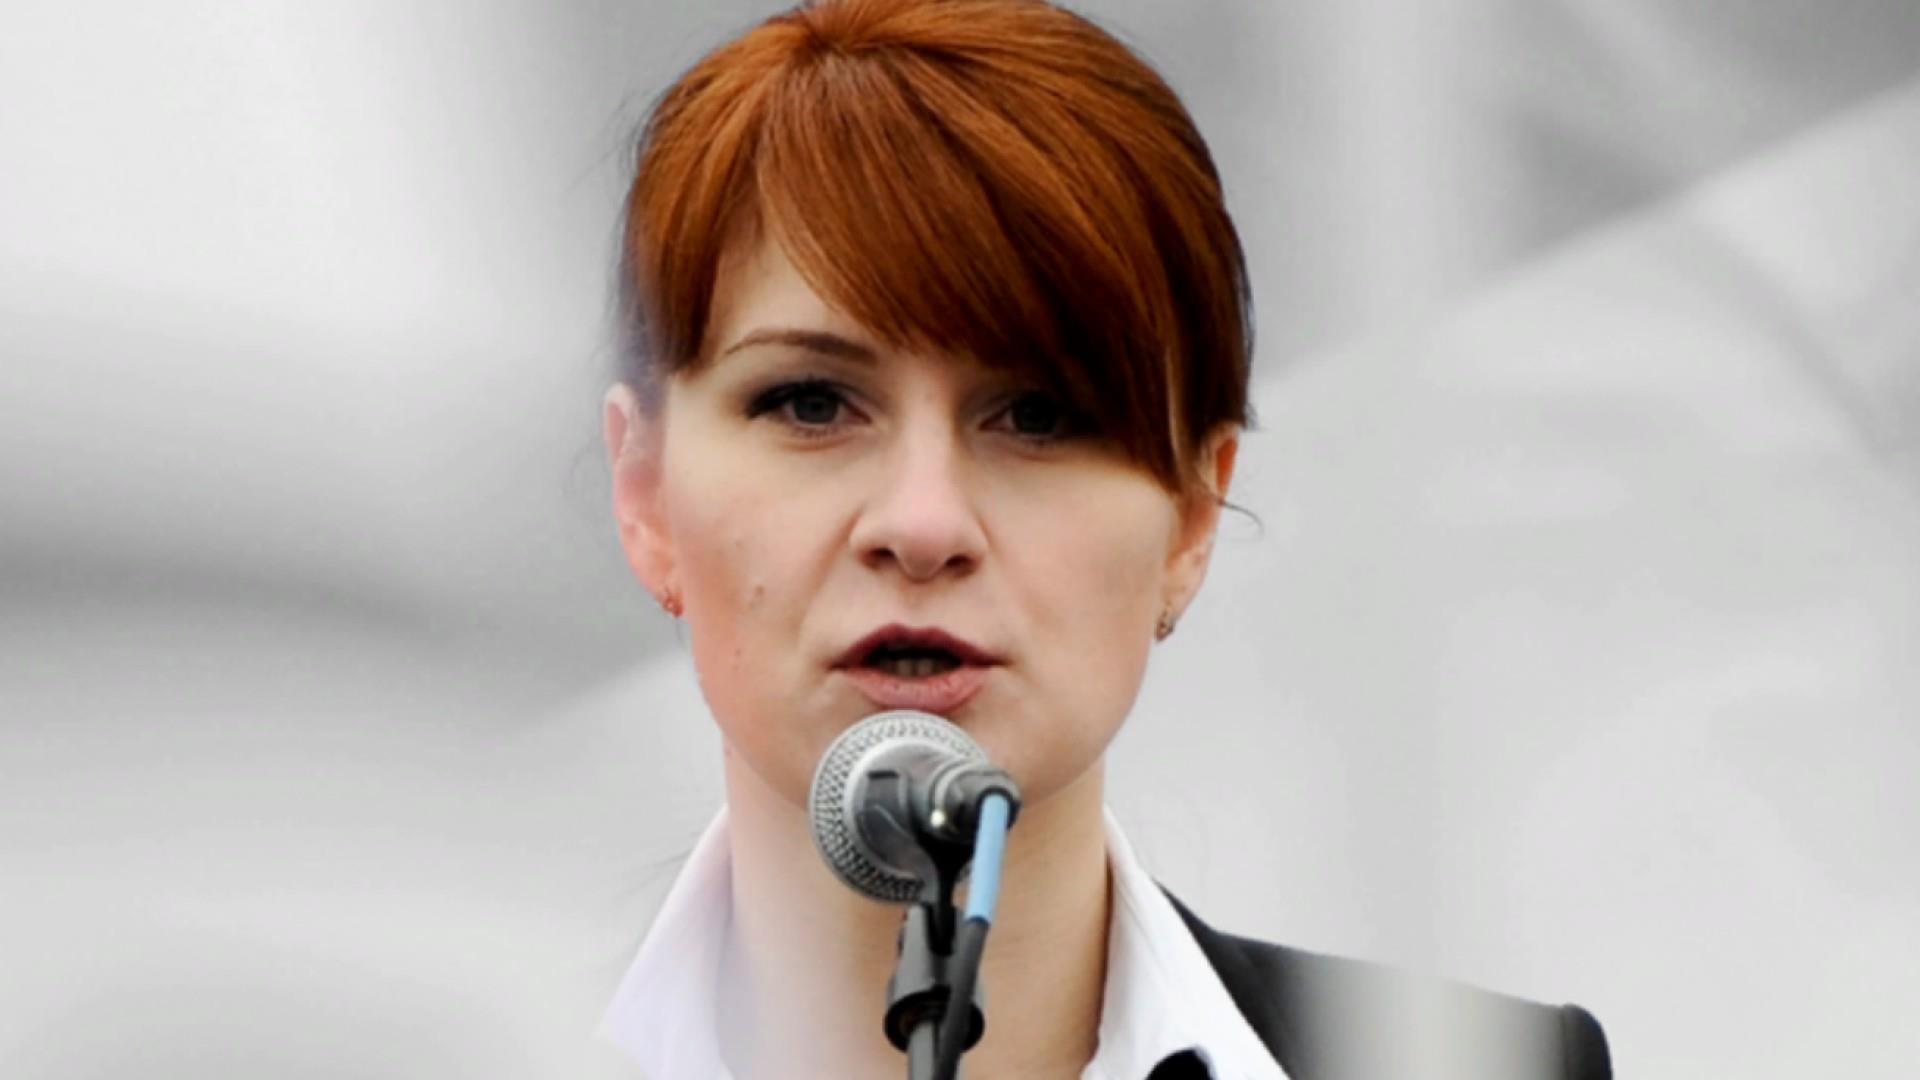 Putin: I asked around & no one knows anything about Maria Butina